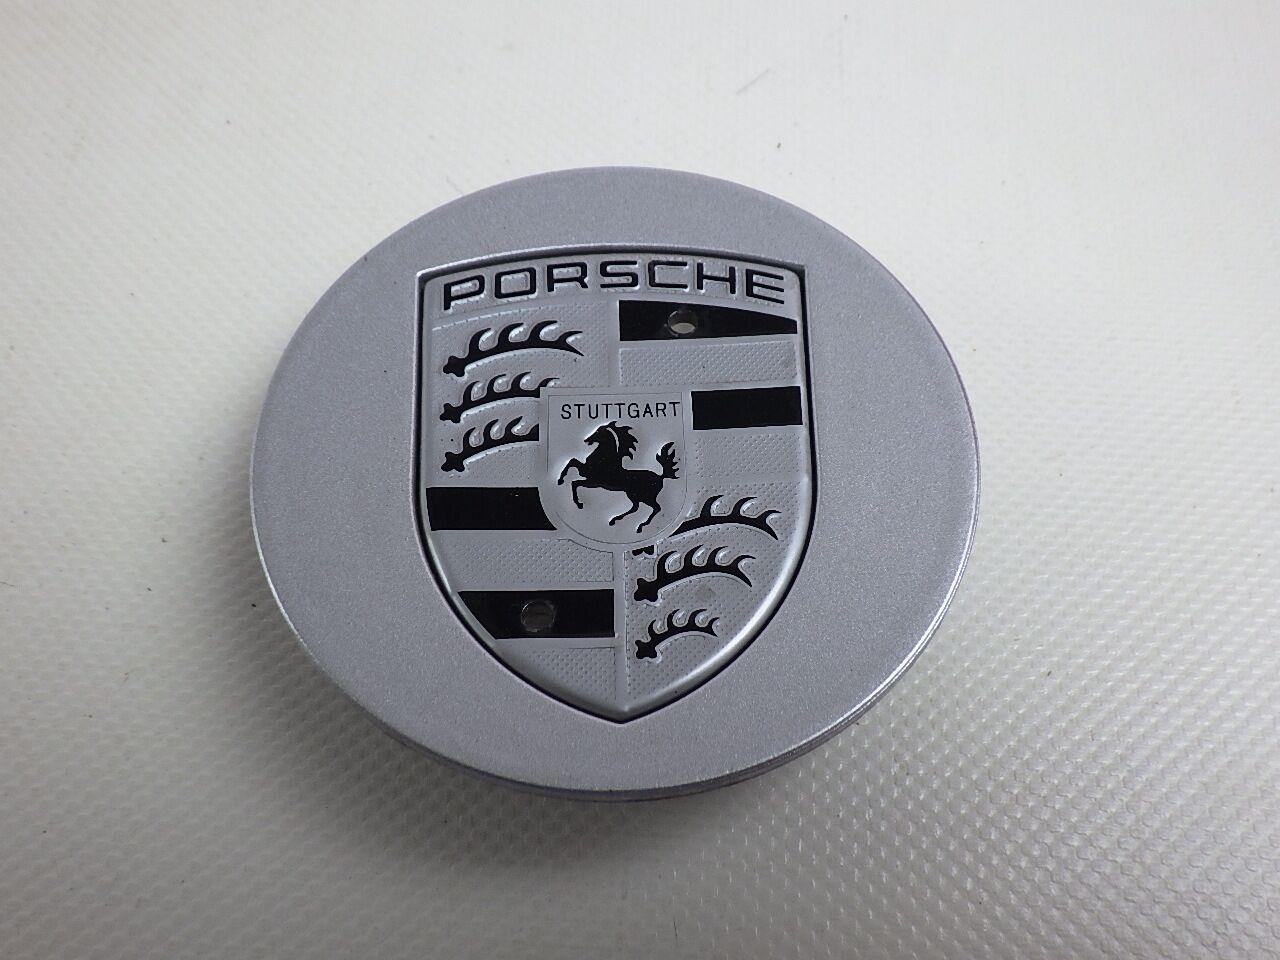 Abdeckung PORSCHE 911 (997) 3.8 Carrera S  261 kW  355 PS (07.2004-12.2008)